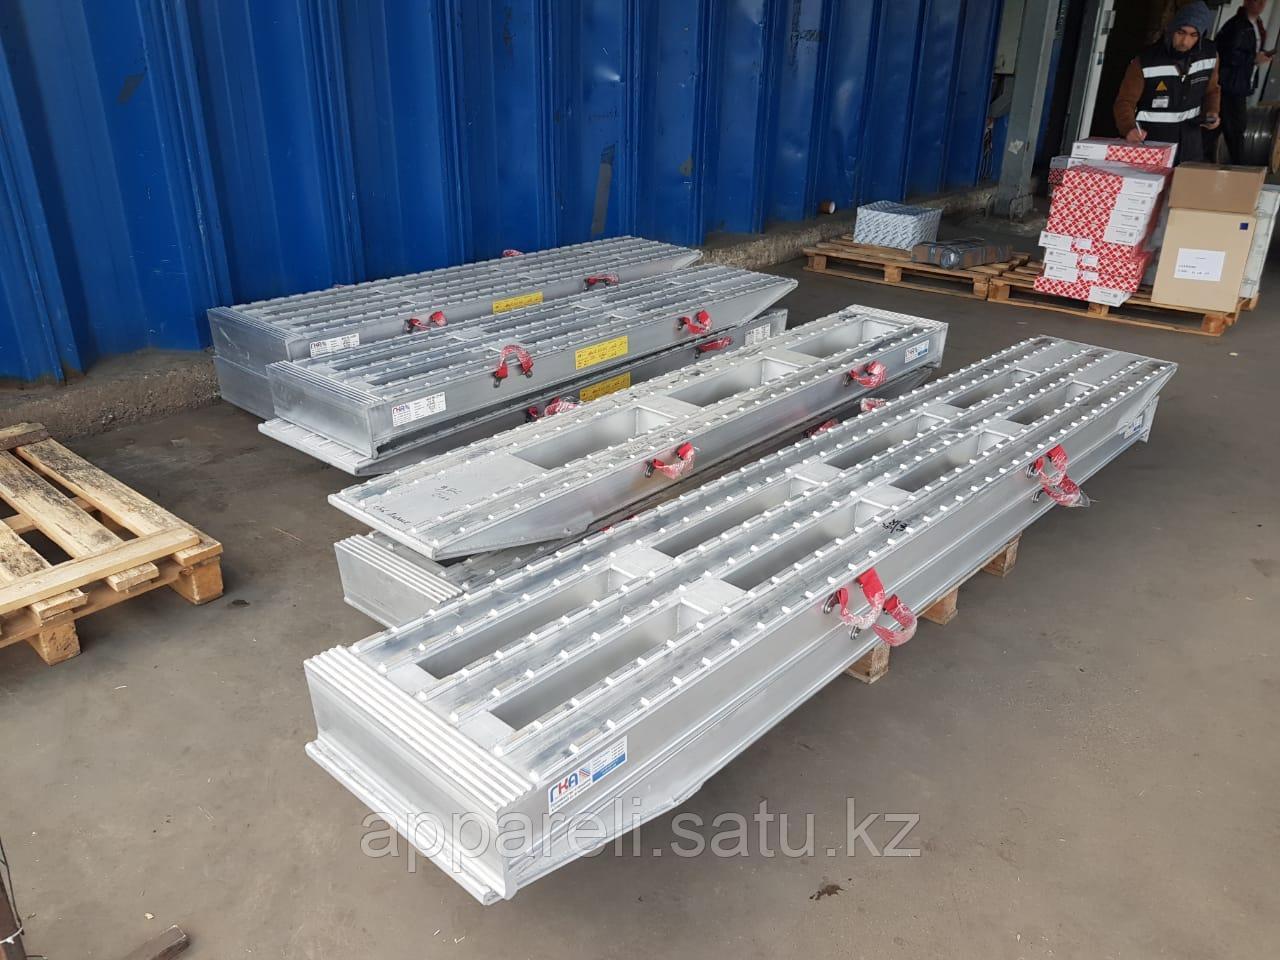 Алюминиевые сходни от производителя (трап, аппарель) от 16 до 22 тонн